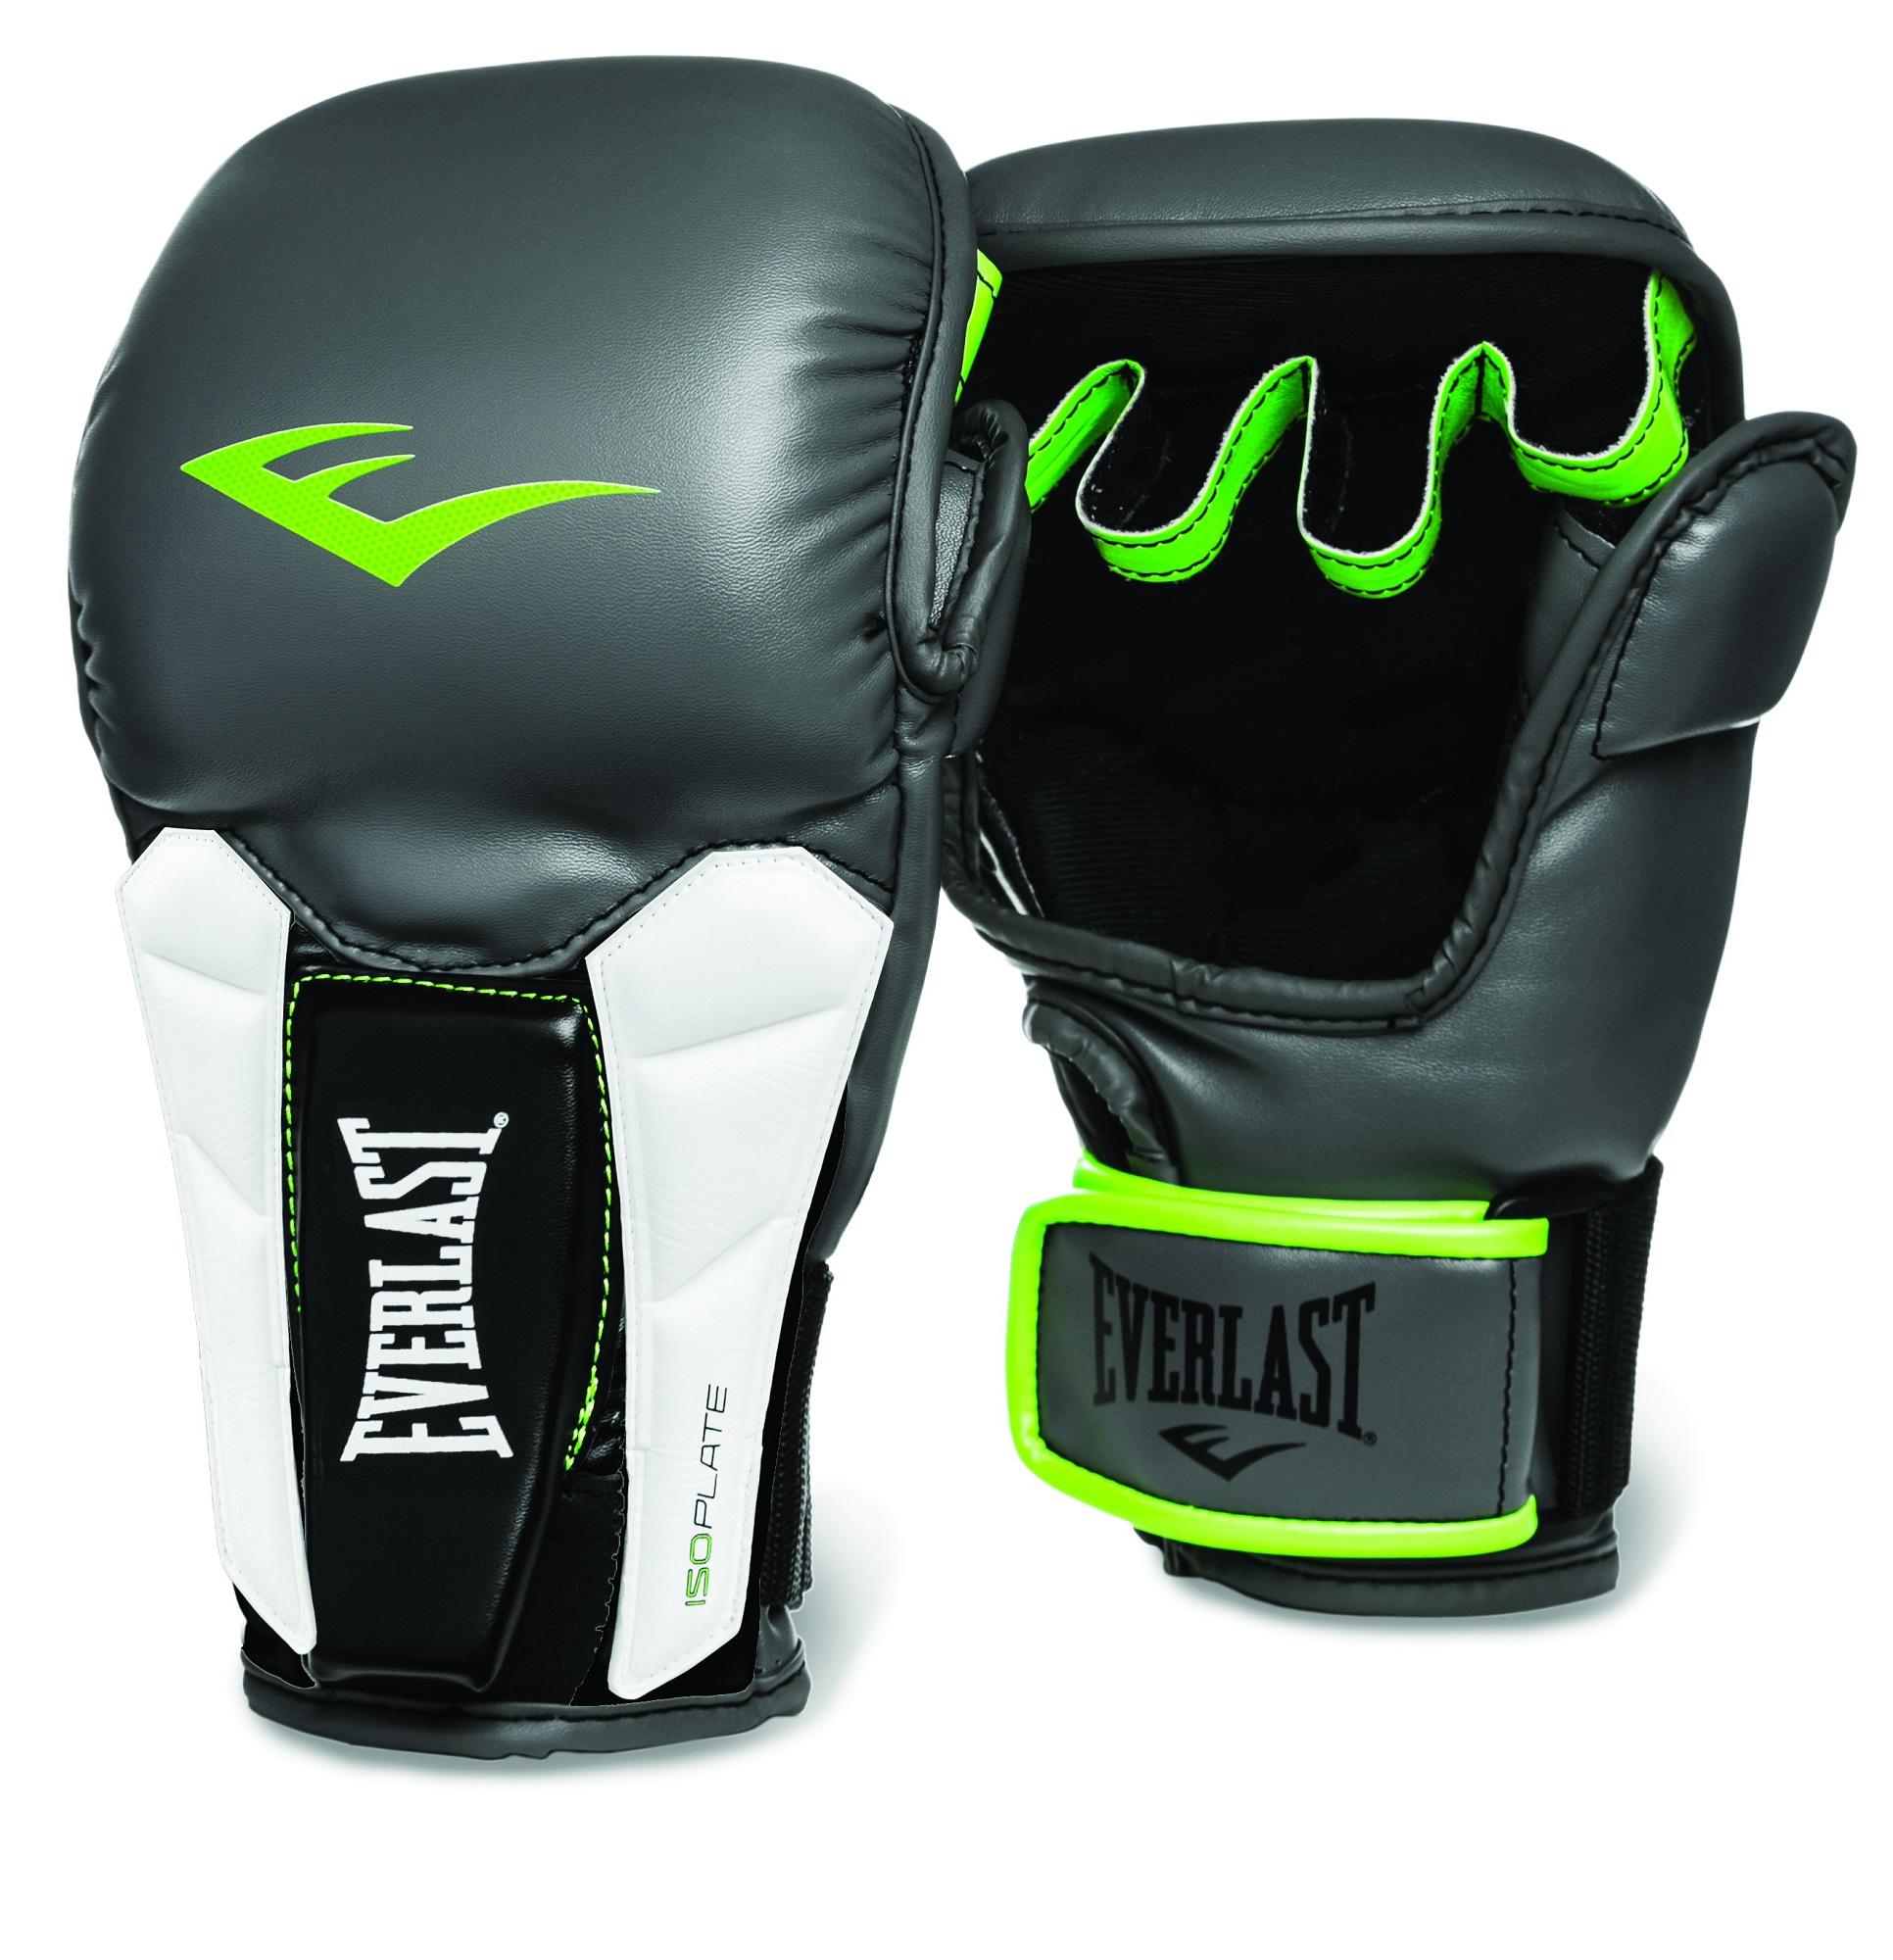 Everlast Перчатки тренировочные MMA Everlast Prime, размер S-M цена